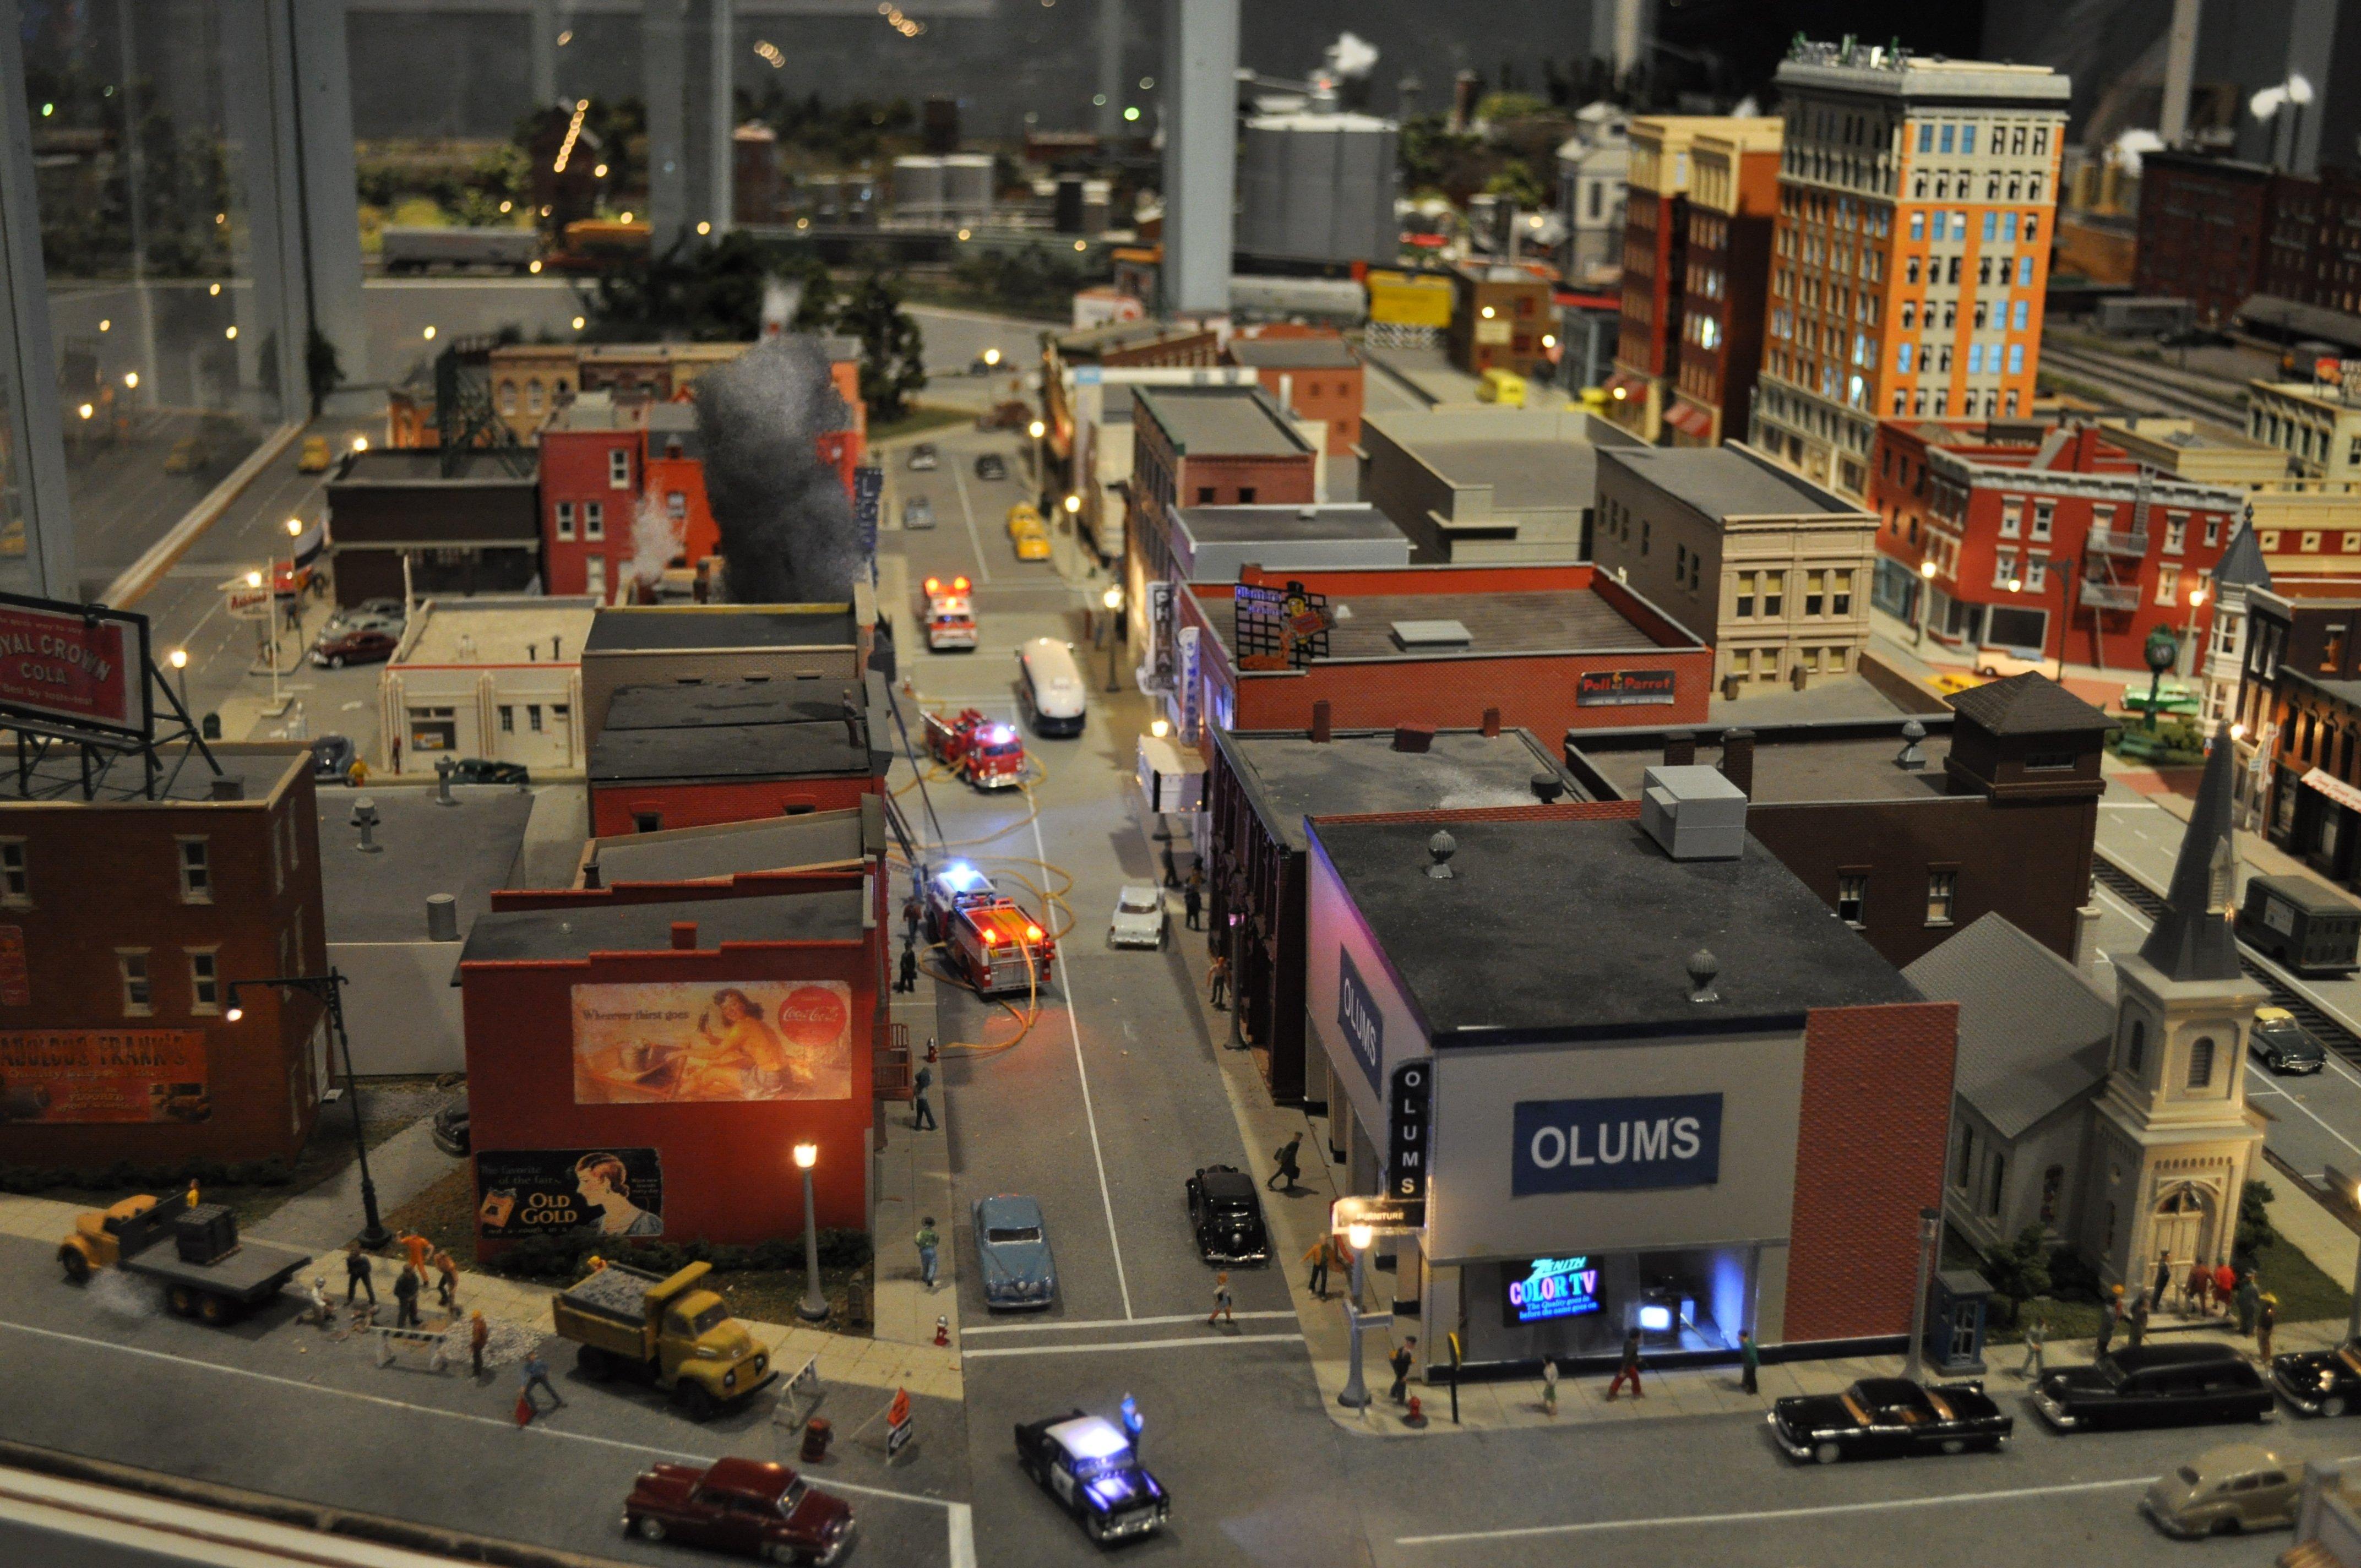 Model Train Train Toy Model Railroad Minature Trains